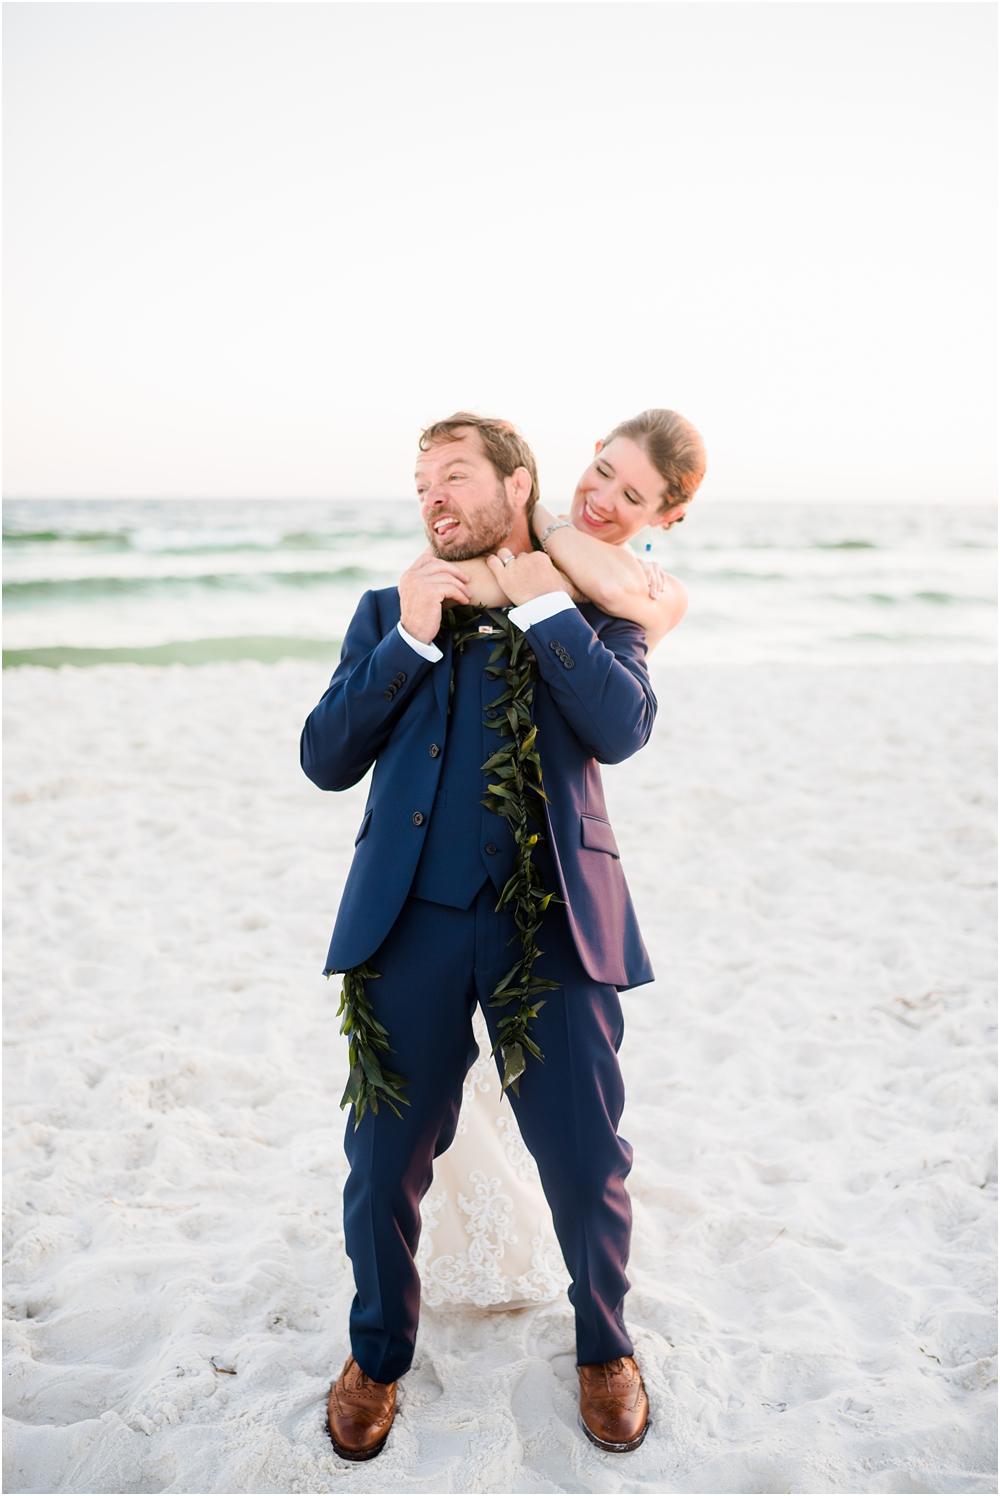 ledman-wedding-kiersten-stevenson-photography-30a-panama-city-beach-dothan-tallahassee-(501-of-763).JPG